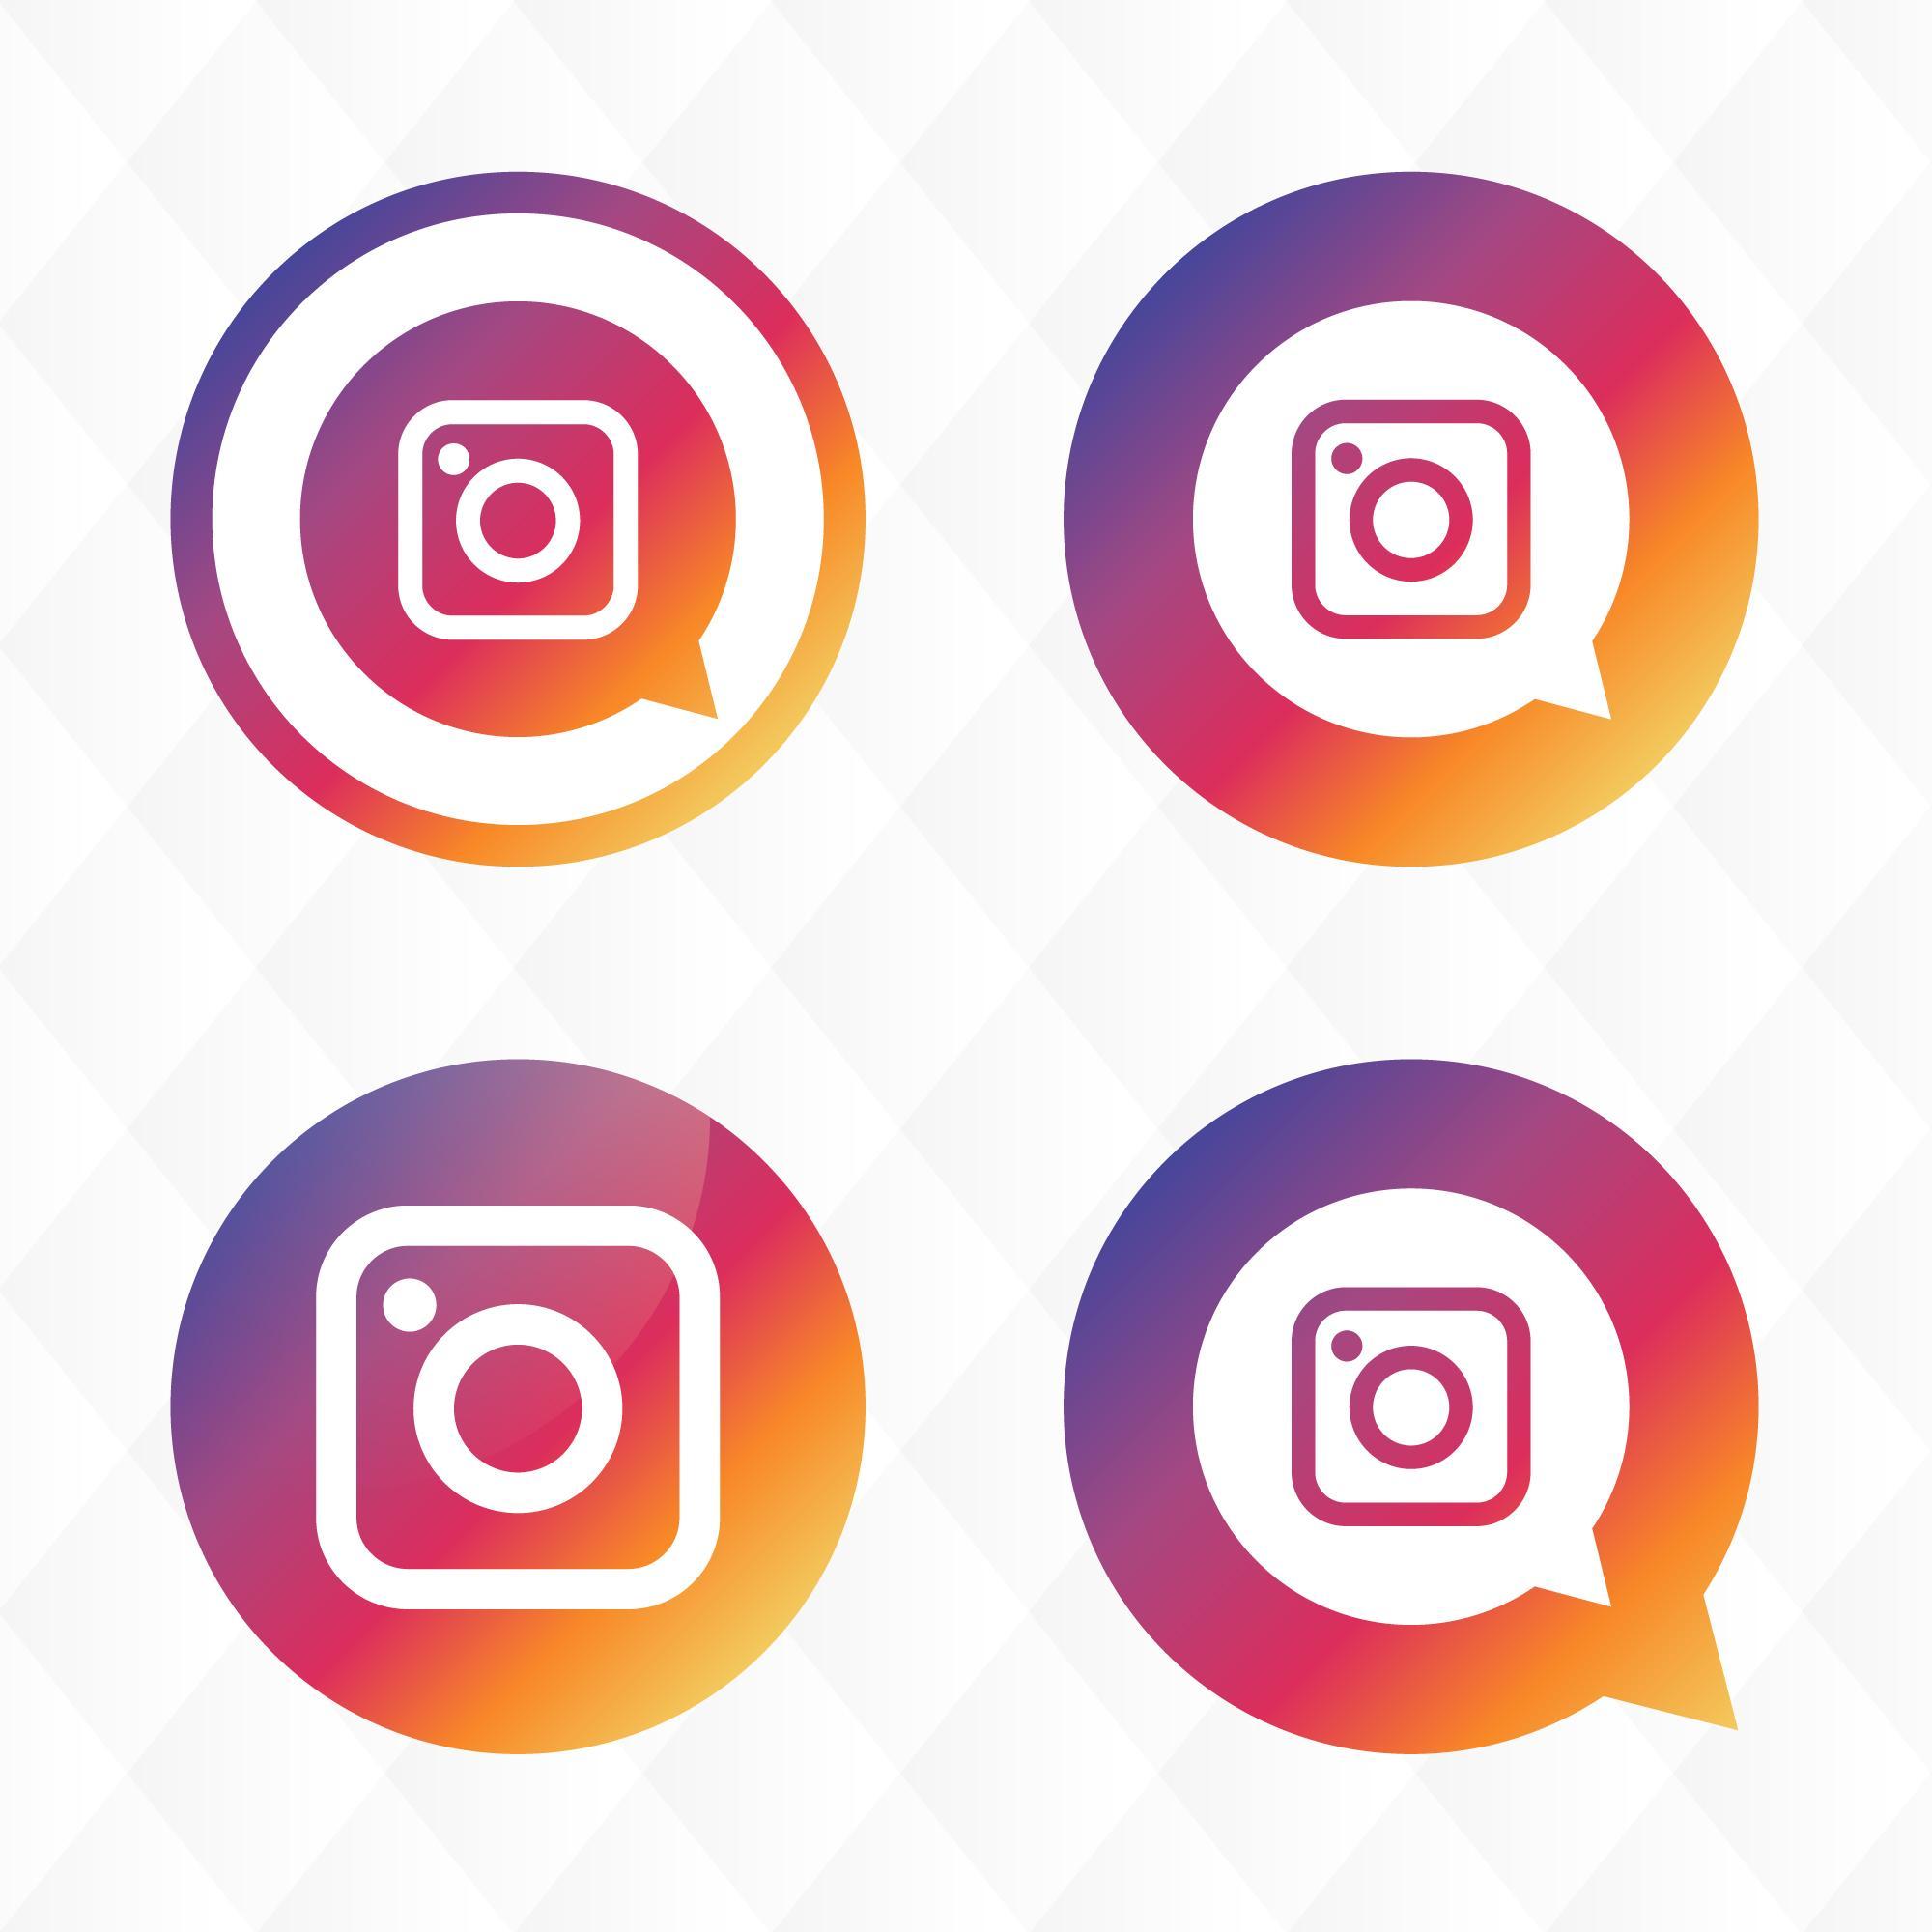 Top Circle Instagram Logo Vector Images » Free Vector Art.